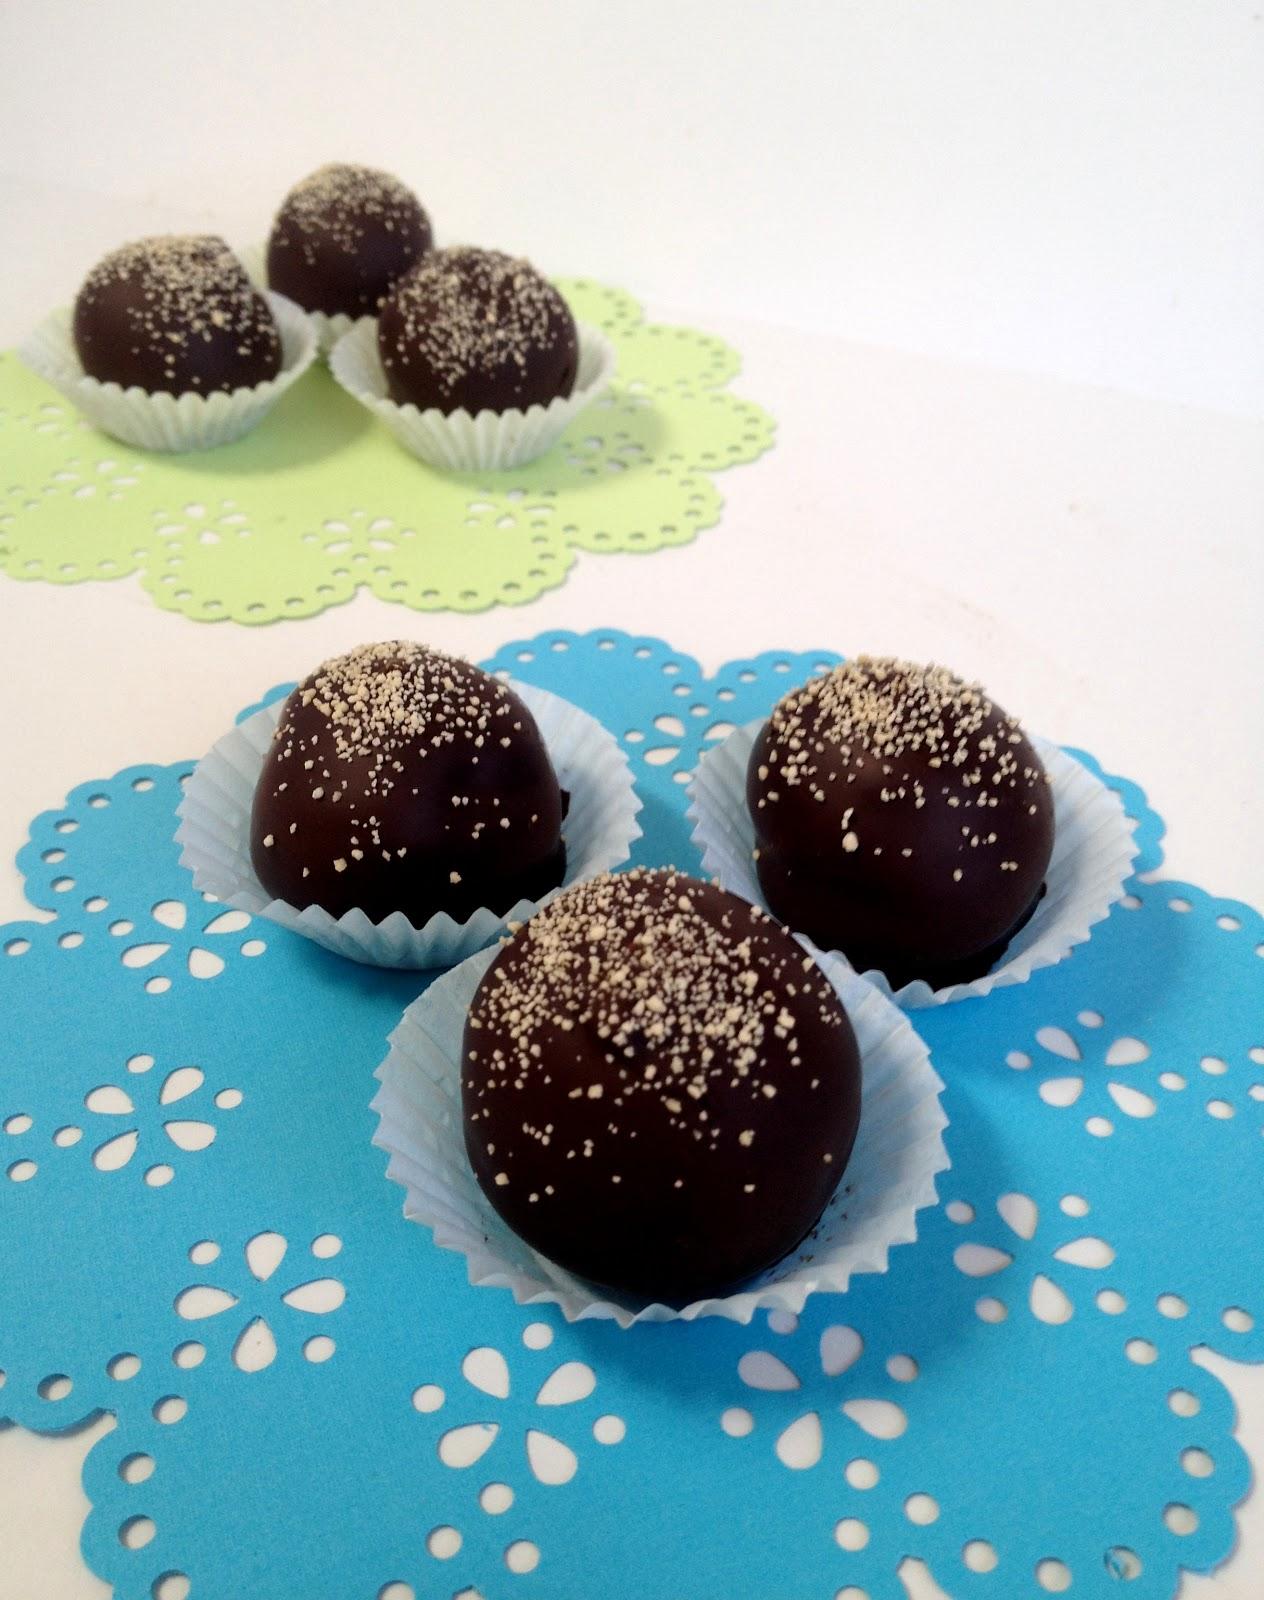 ... No. 17*: Melt-In-Your-Mouth Dark Chocolate Honey Truffles {recipe